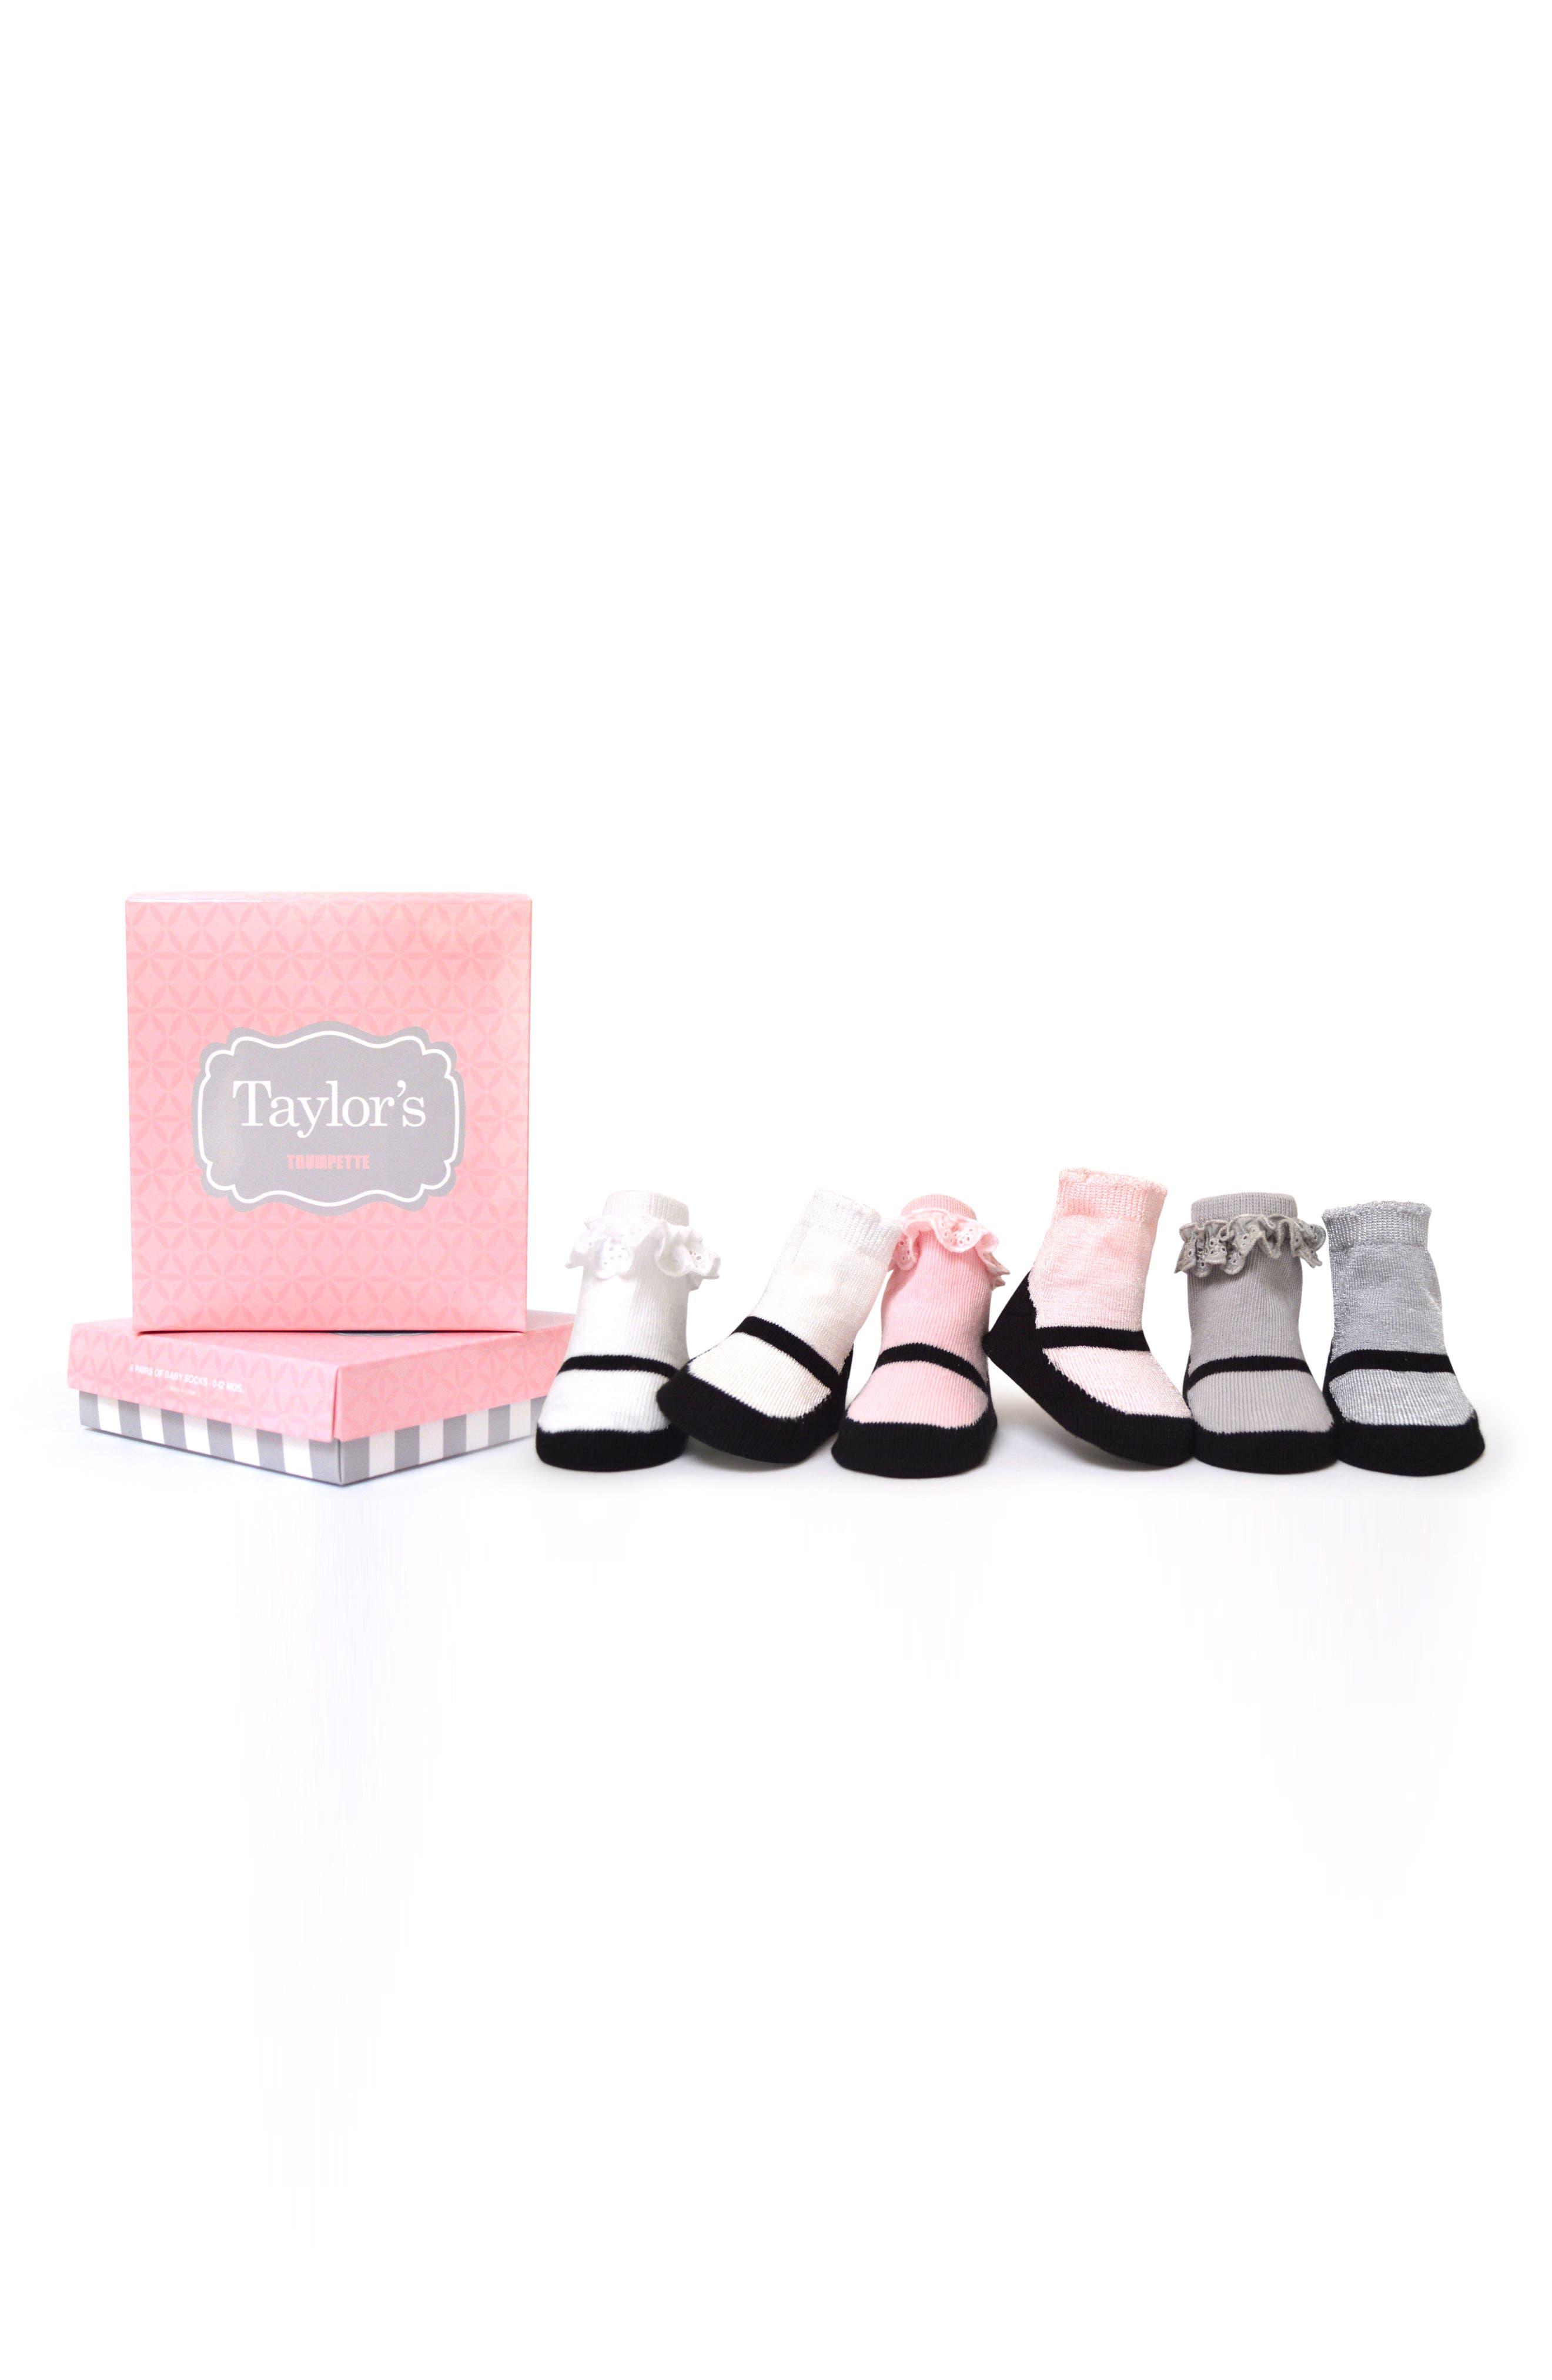 Taylors 6-Pack Socks,                         Main,                         color, 001